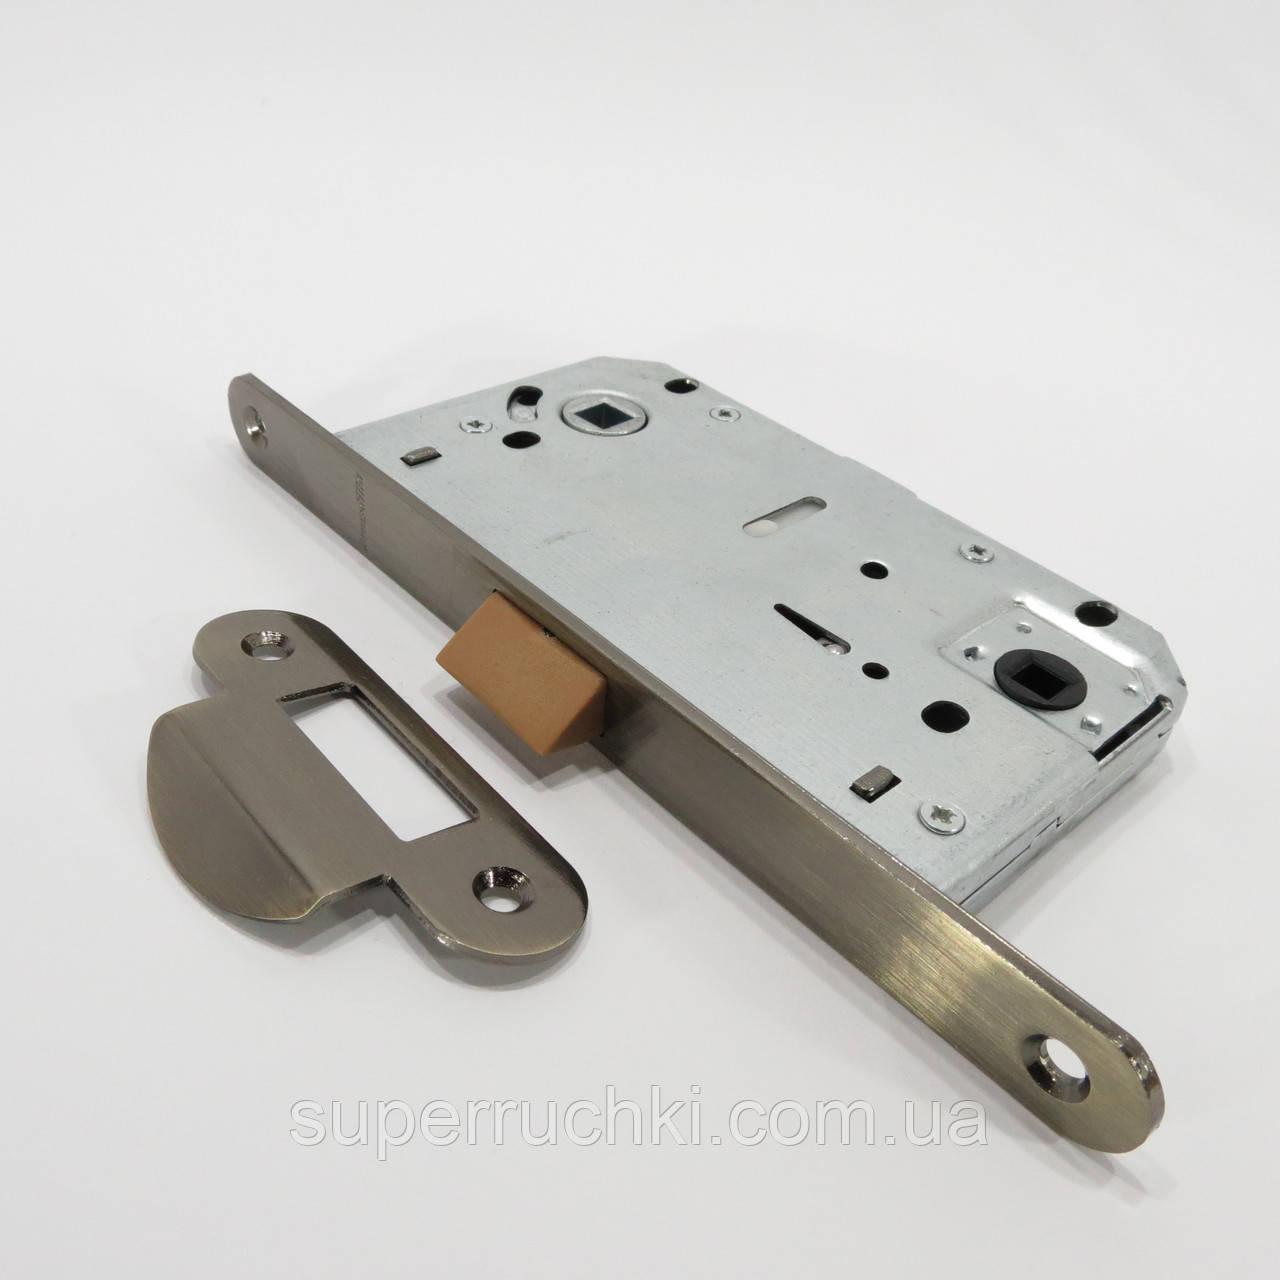 Механизм с фиксатором Armadillo LH 96-50 AB (старая бронза)